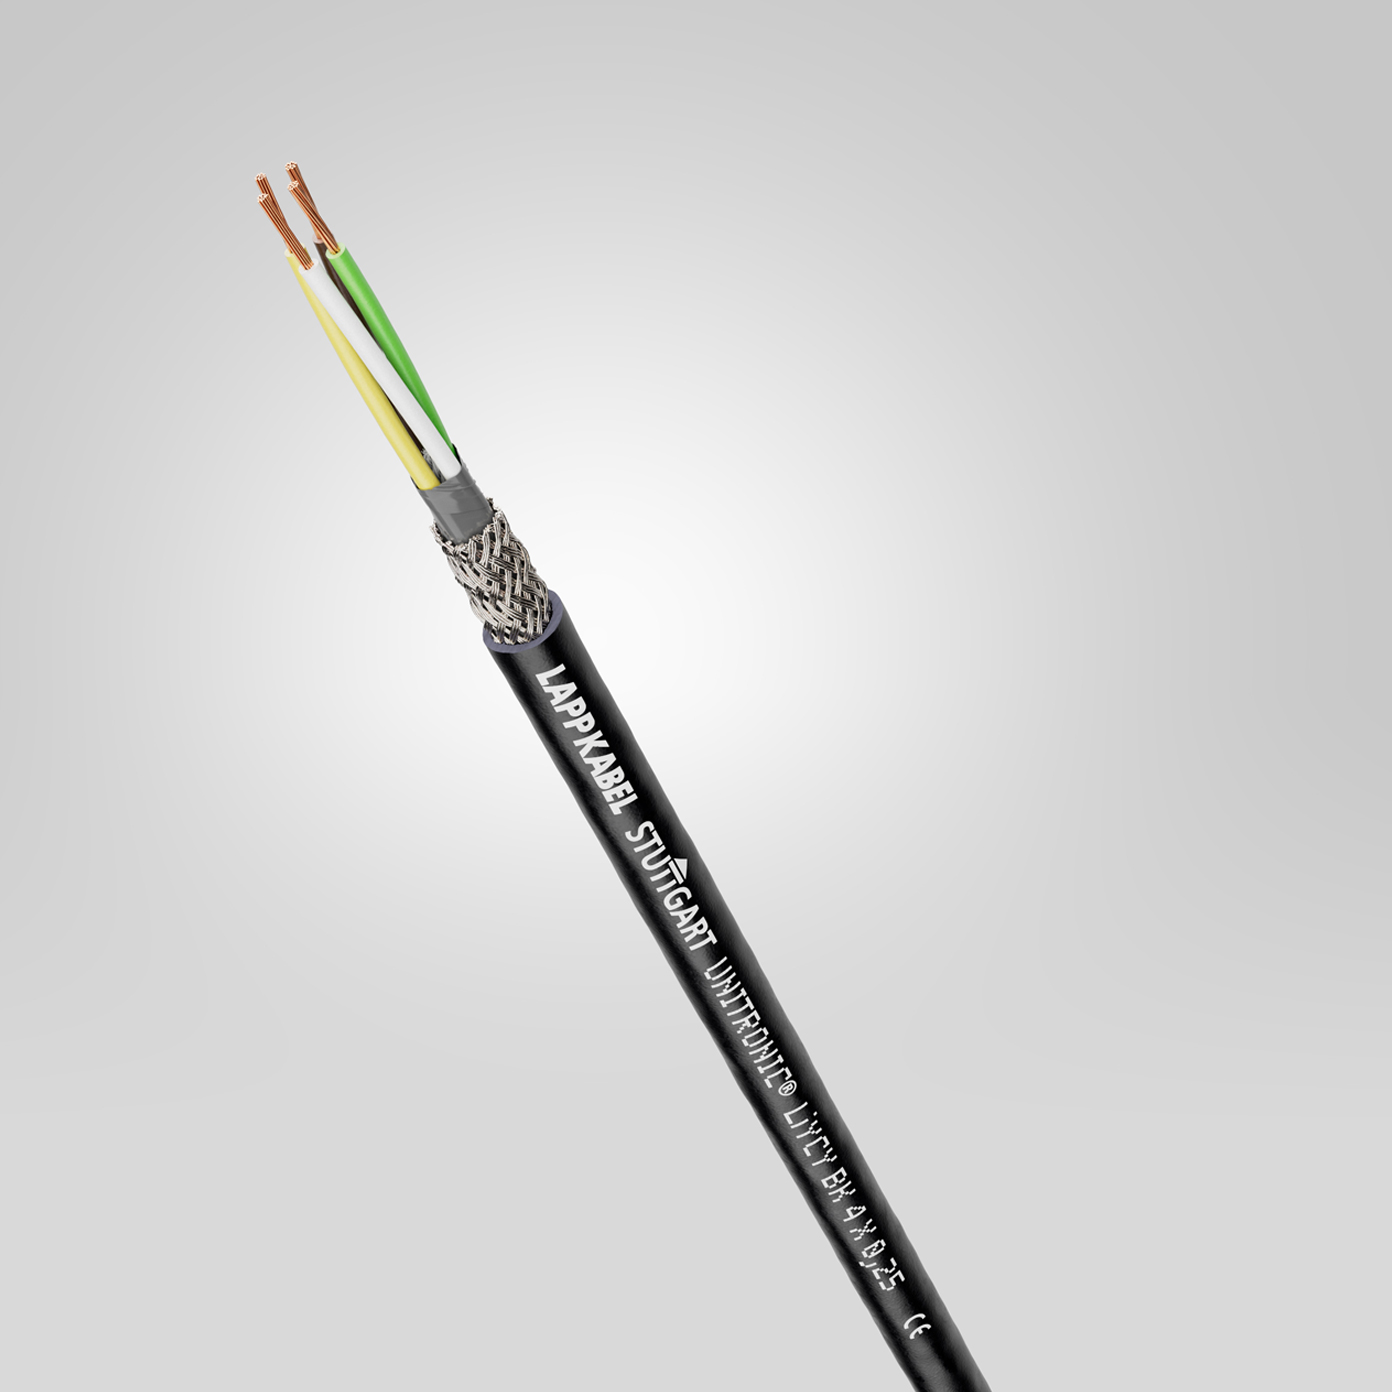 Cables de datos de baja frecuencia para uso en exteriores